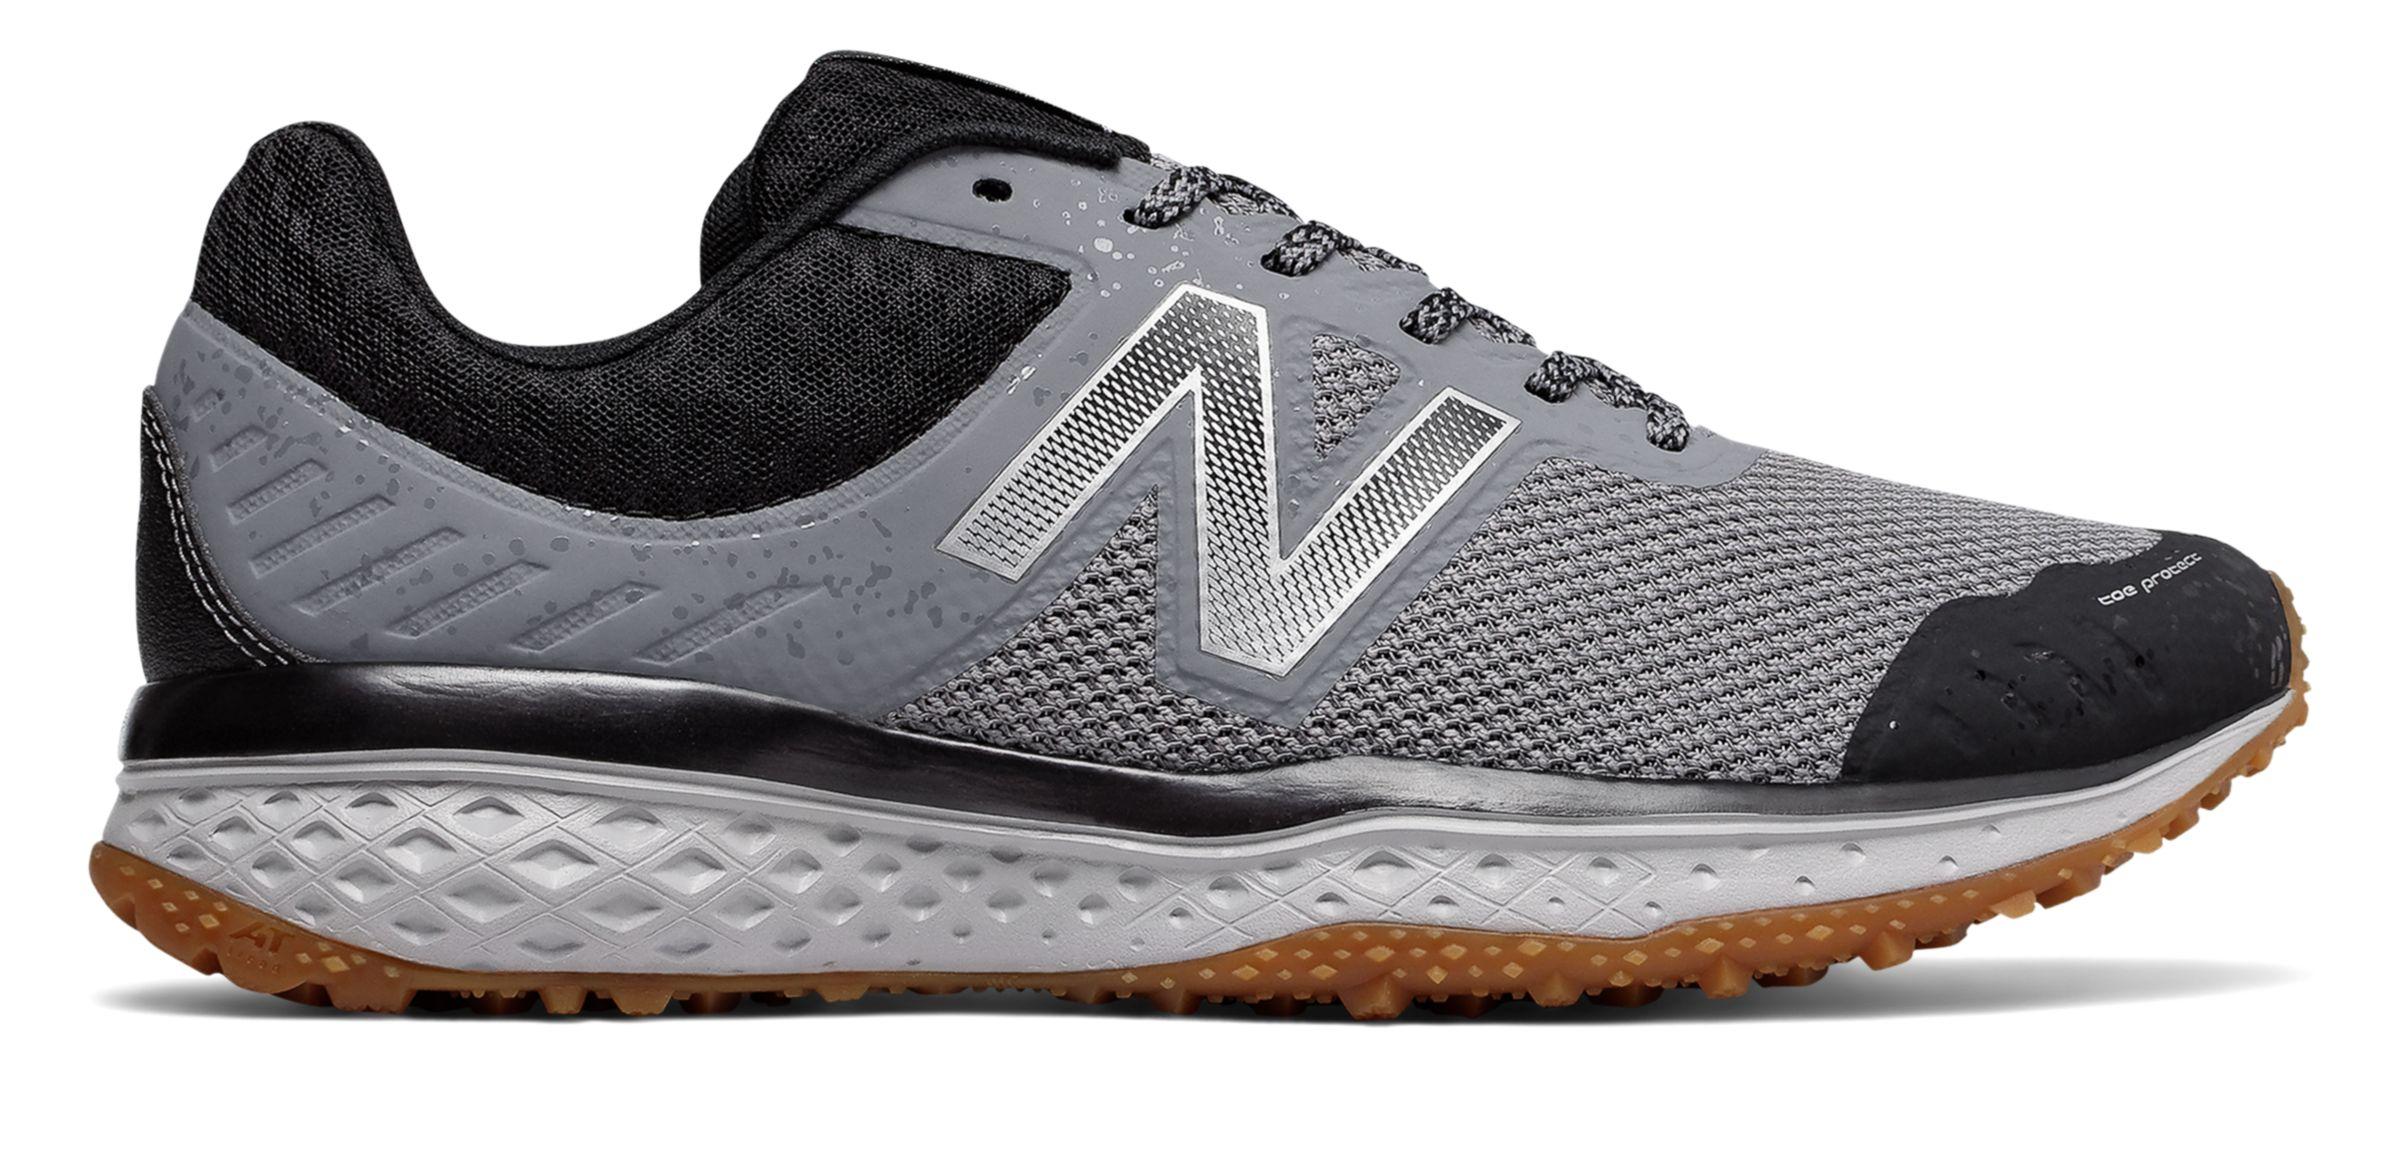 Men\u0027s New Balance Shoes Under $45   Deep Discounts on New Balance Shoes    Joe\u0027s New Balance Outlet